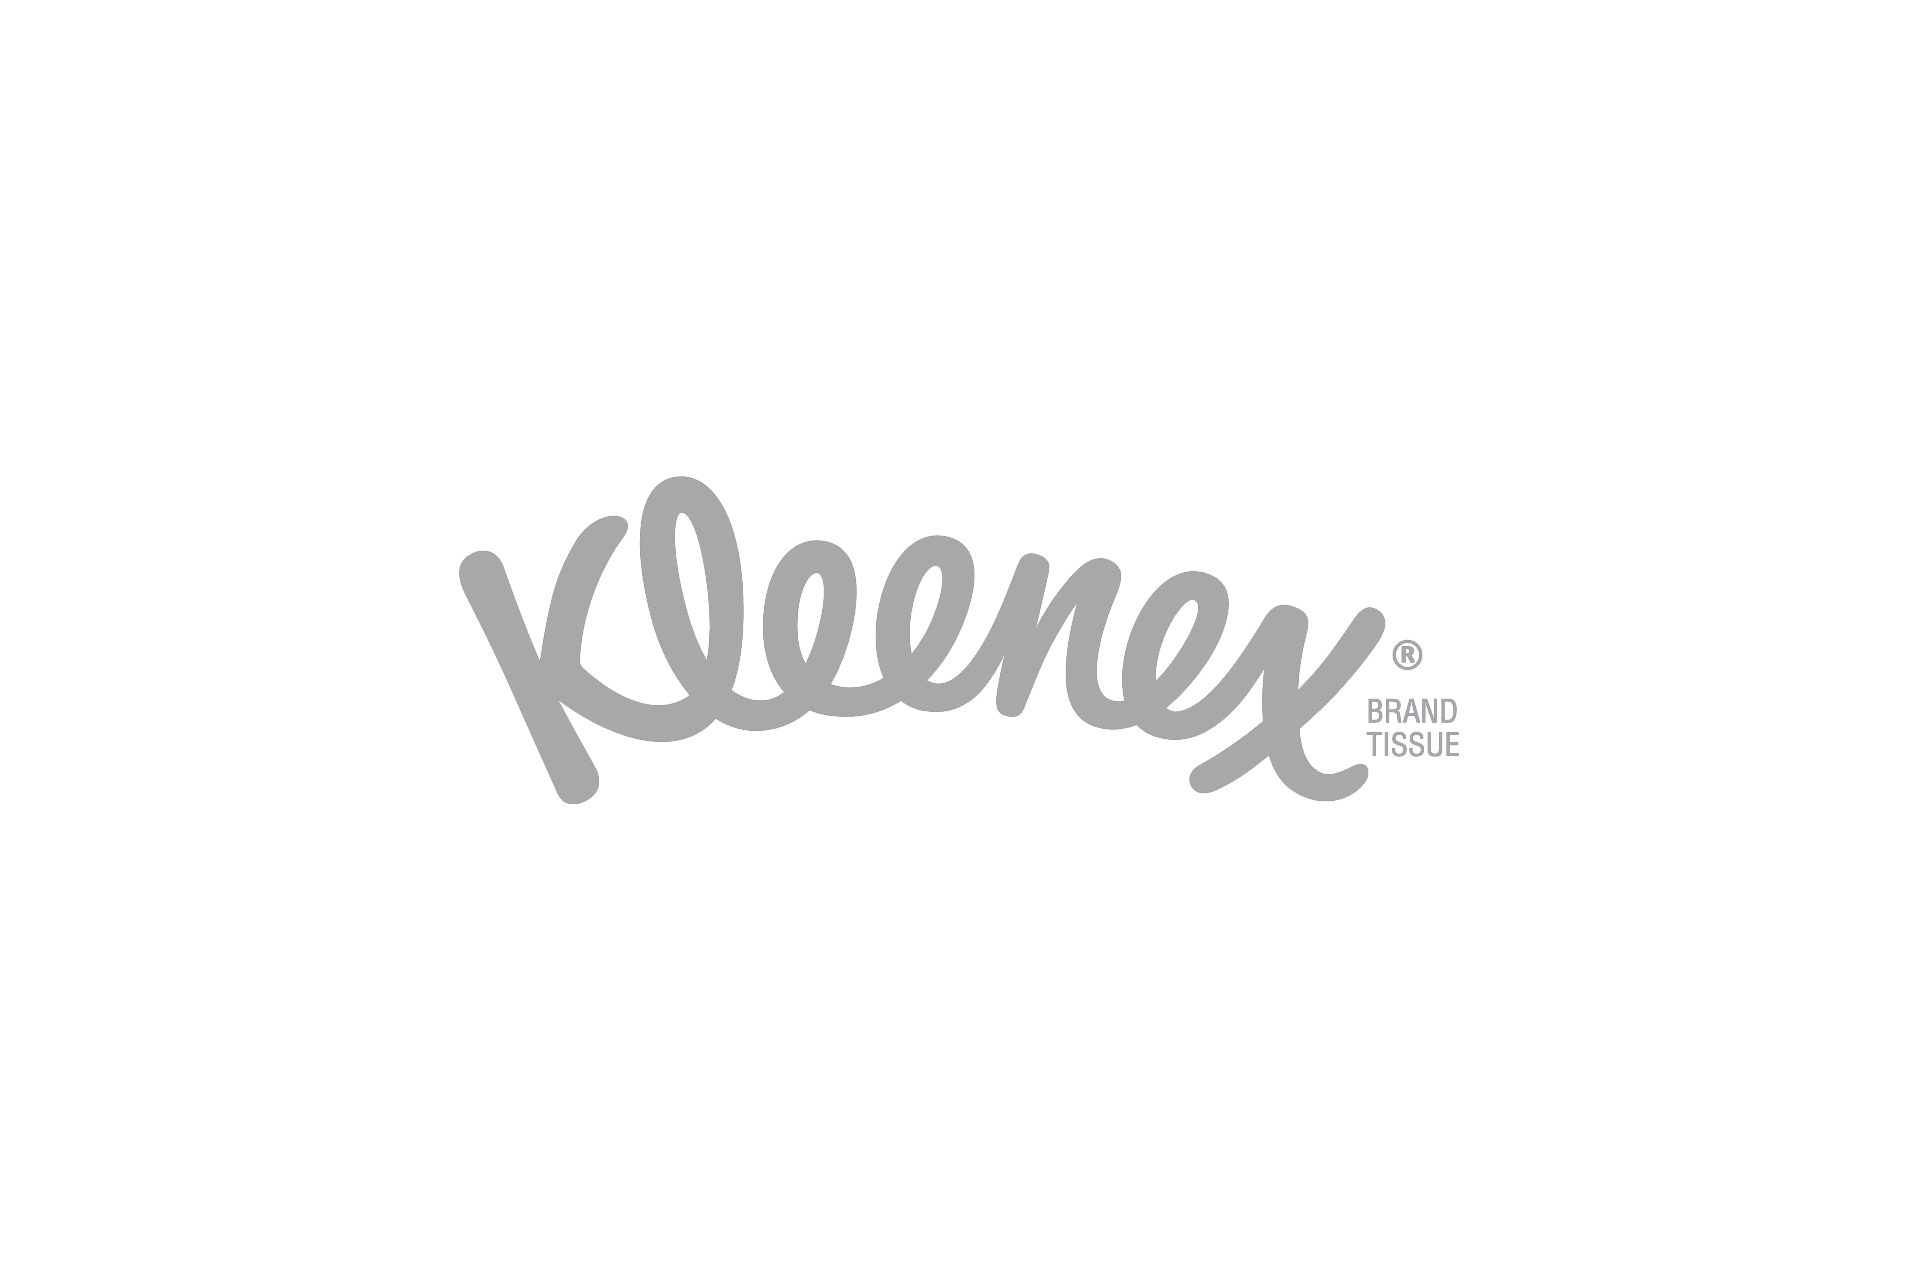 Kleenex logo grey